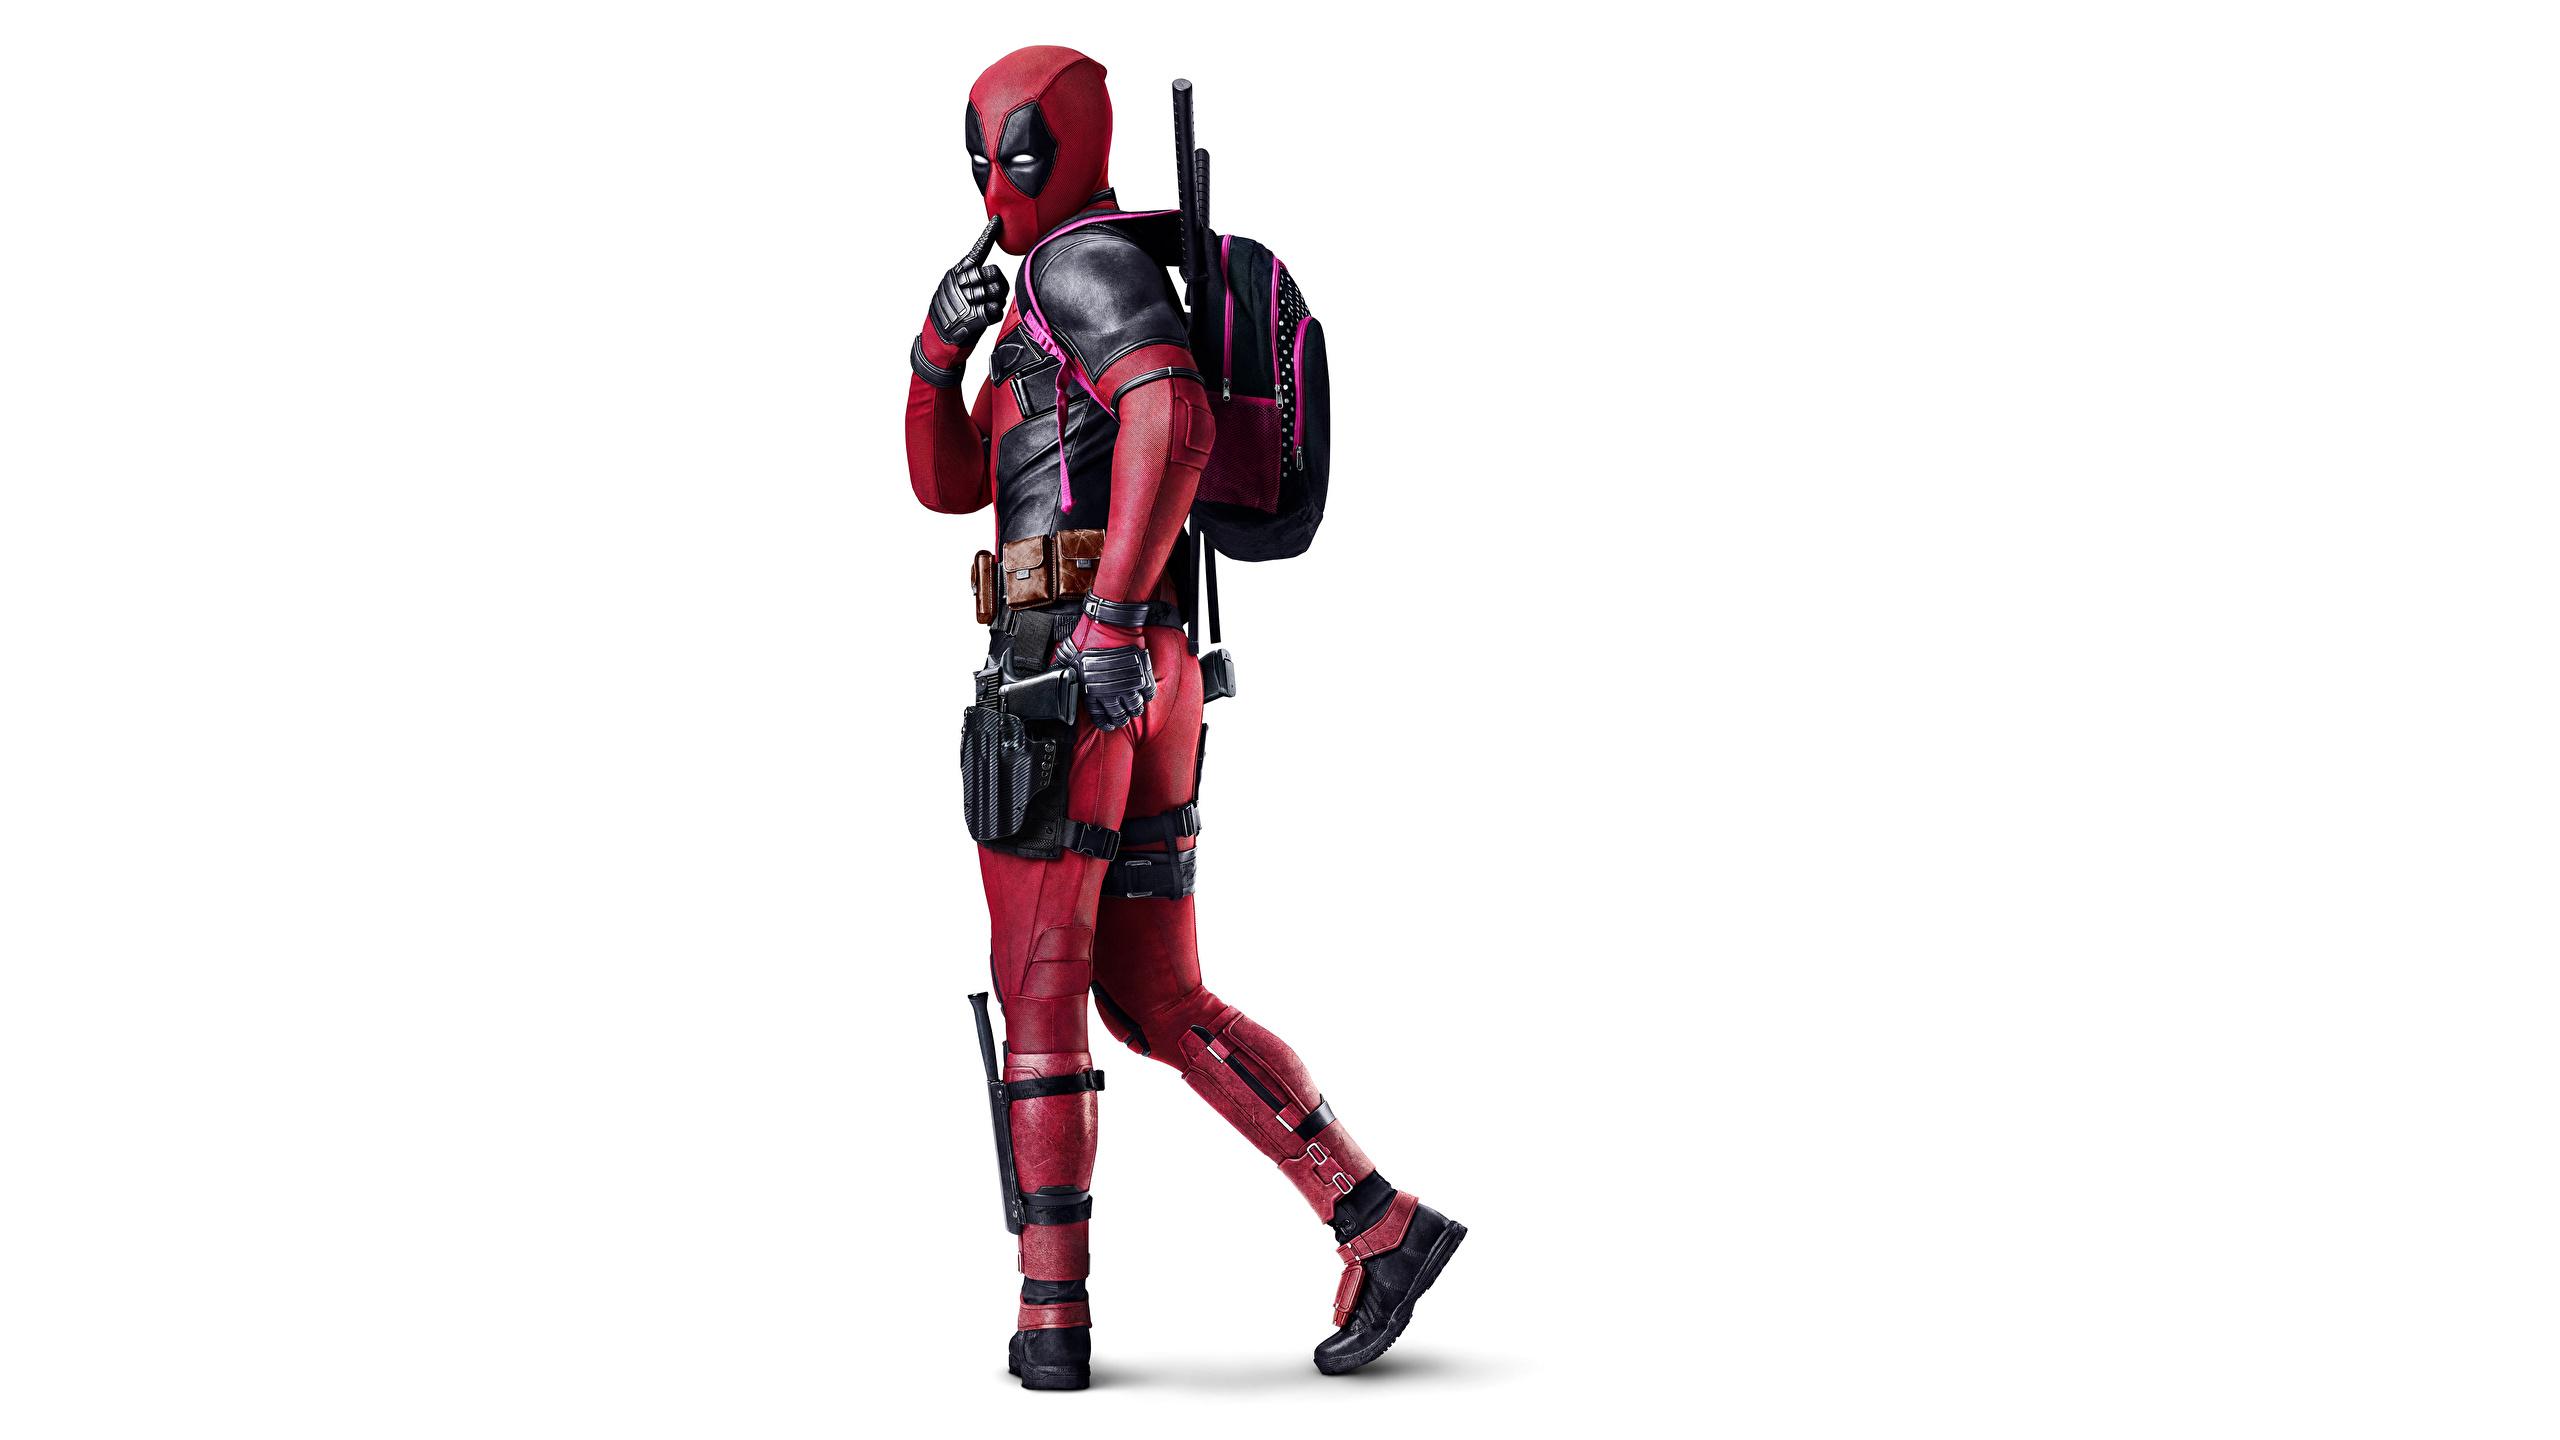 Fonds Decran 2560x1440 Deadpool Héros Fond Blanc Fantasy